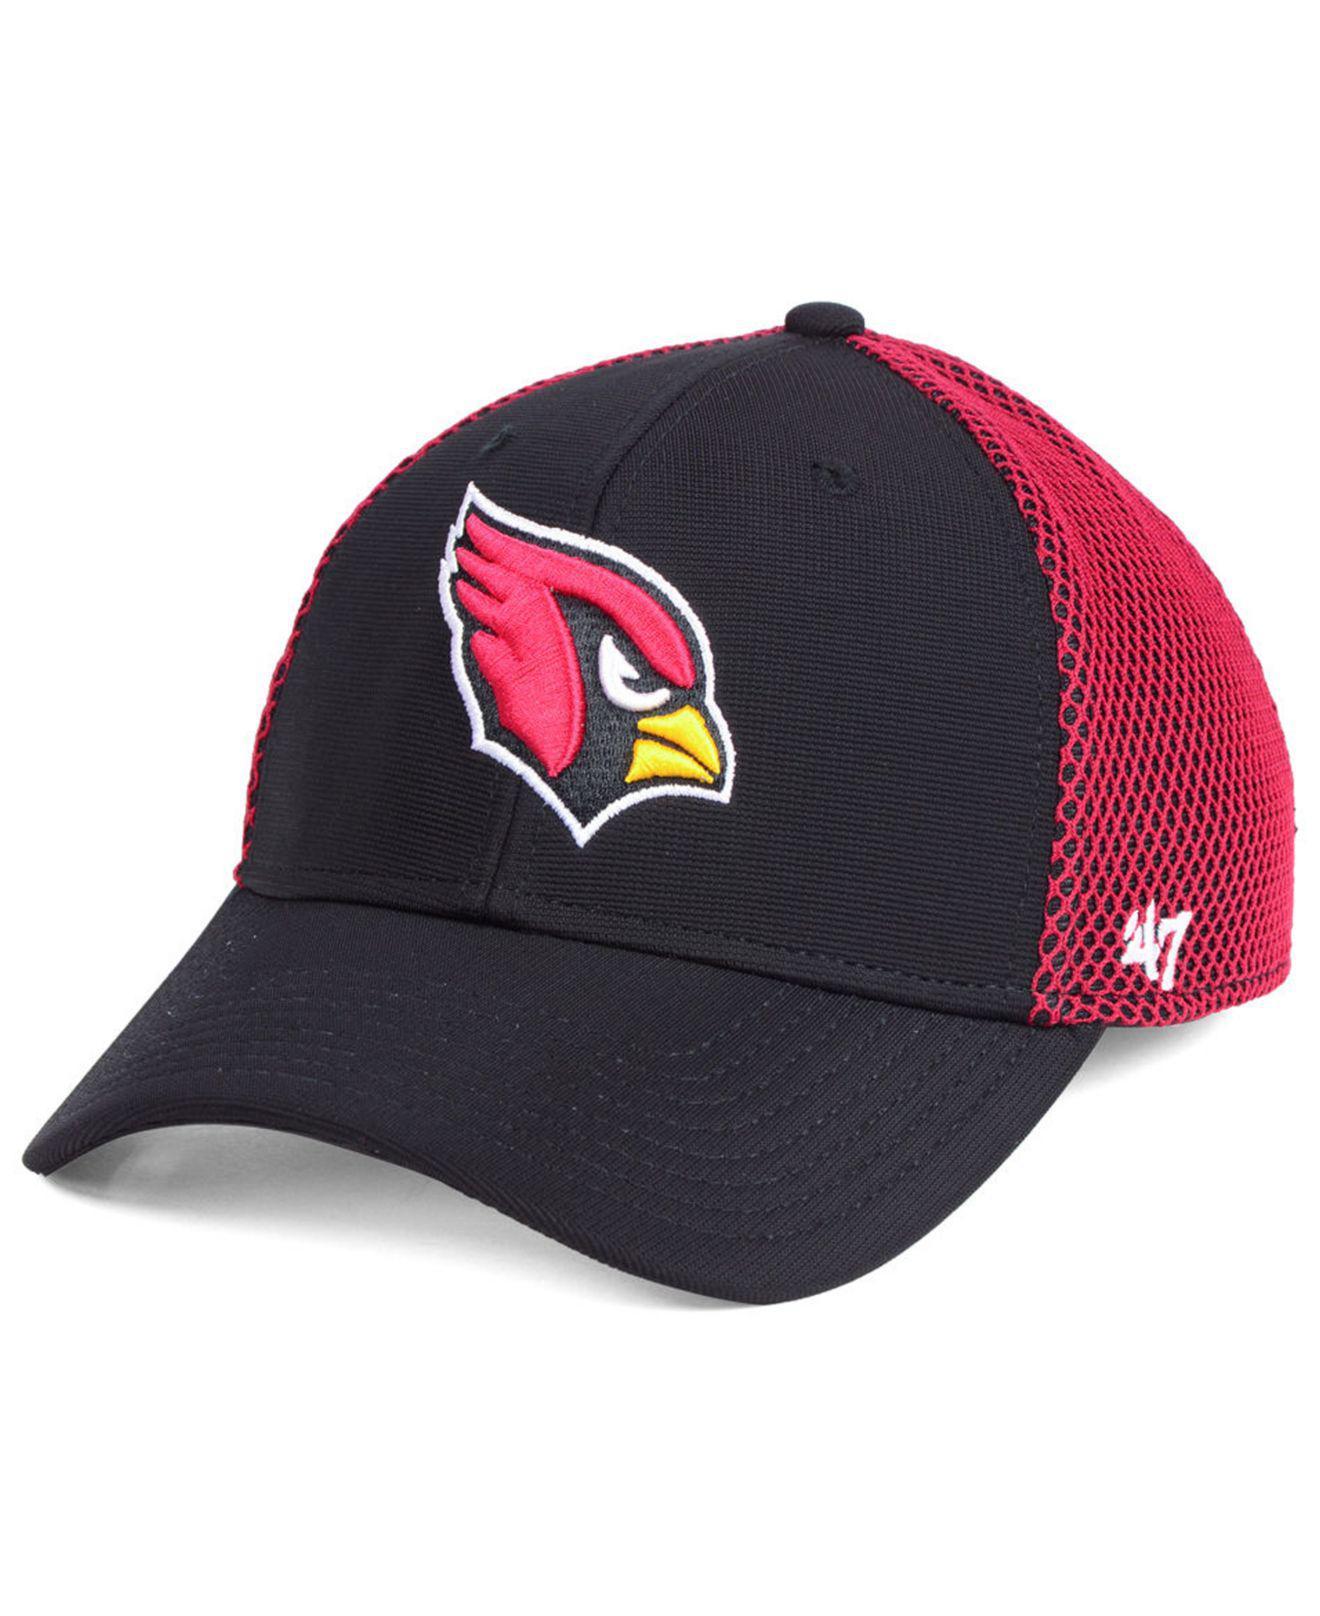 promo code 710eb f5b30 47 Brand. Men s Arizona Cardinals Comfort Contender Flex Cap